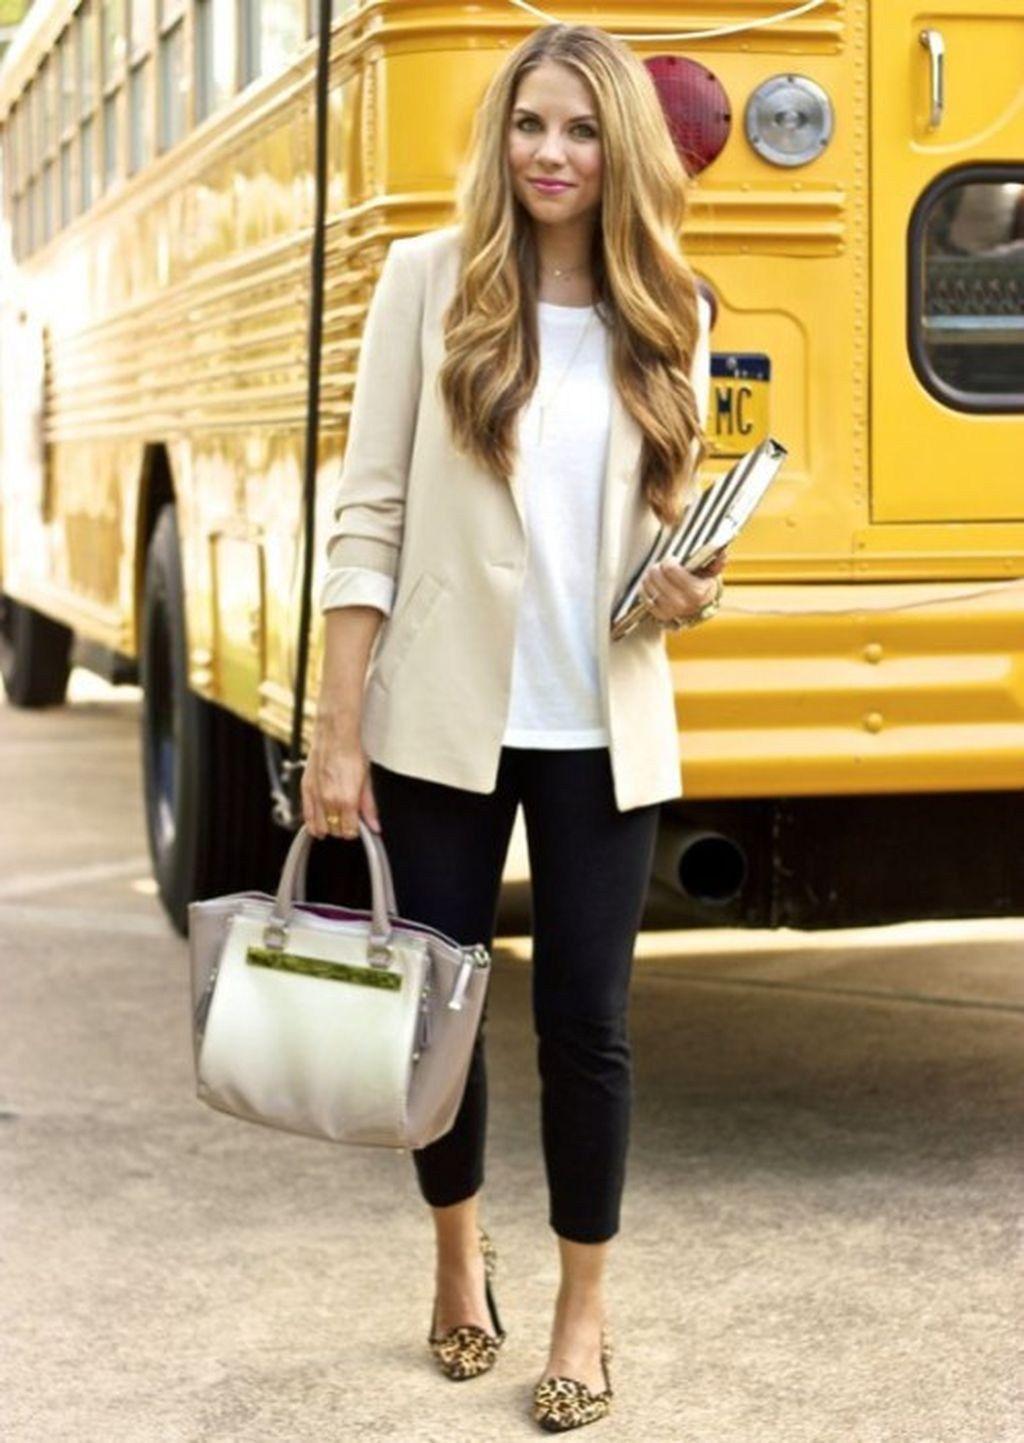 Look - Attire business : women shoes video